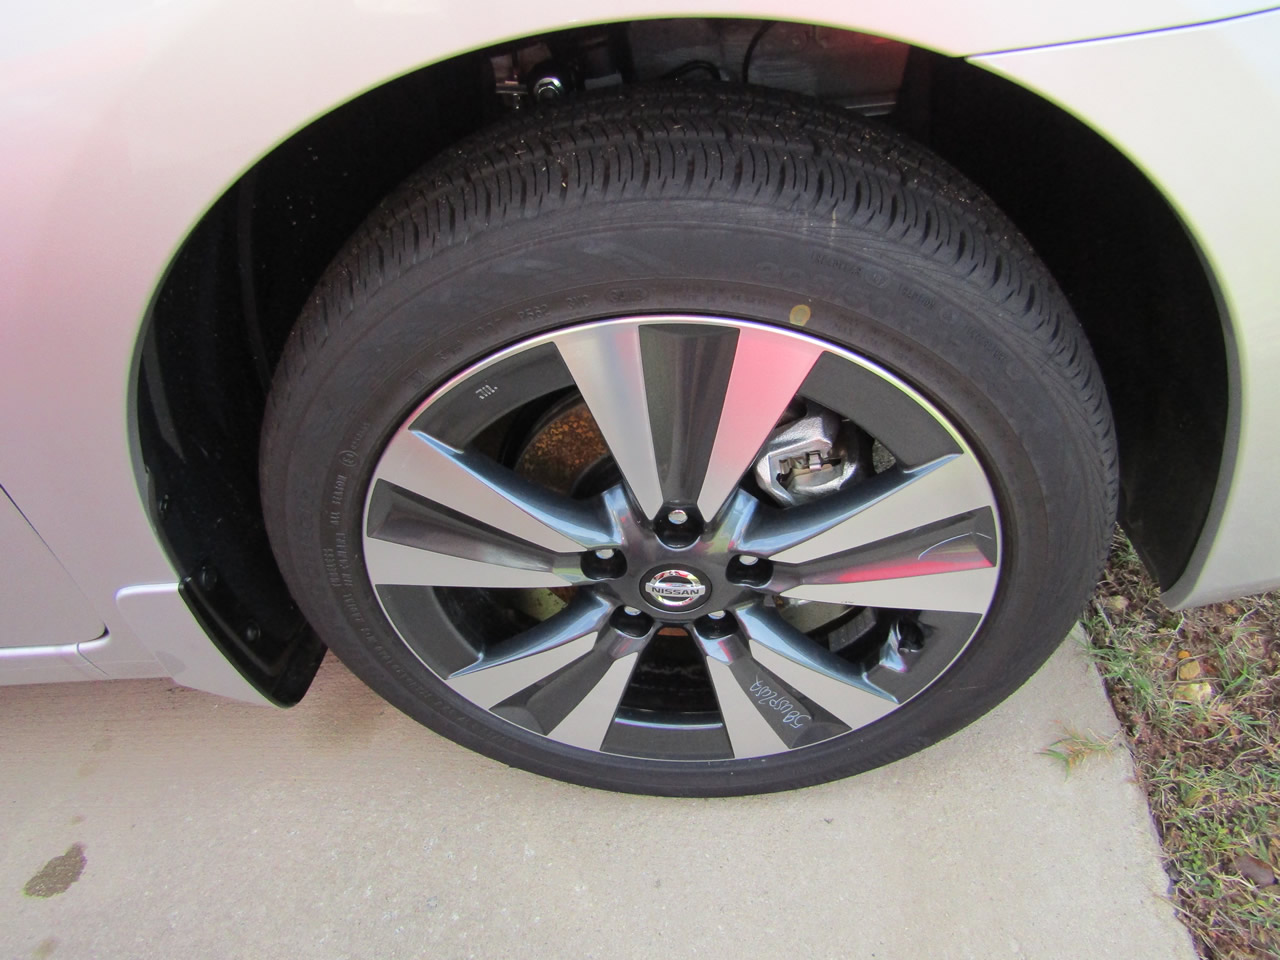 New 2019 Nissan Sentra Sv Vin 3n1ab7apxky228845 Columbia Sc 29210